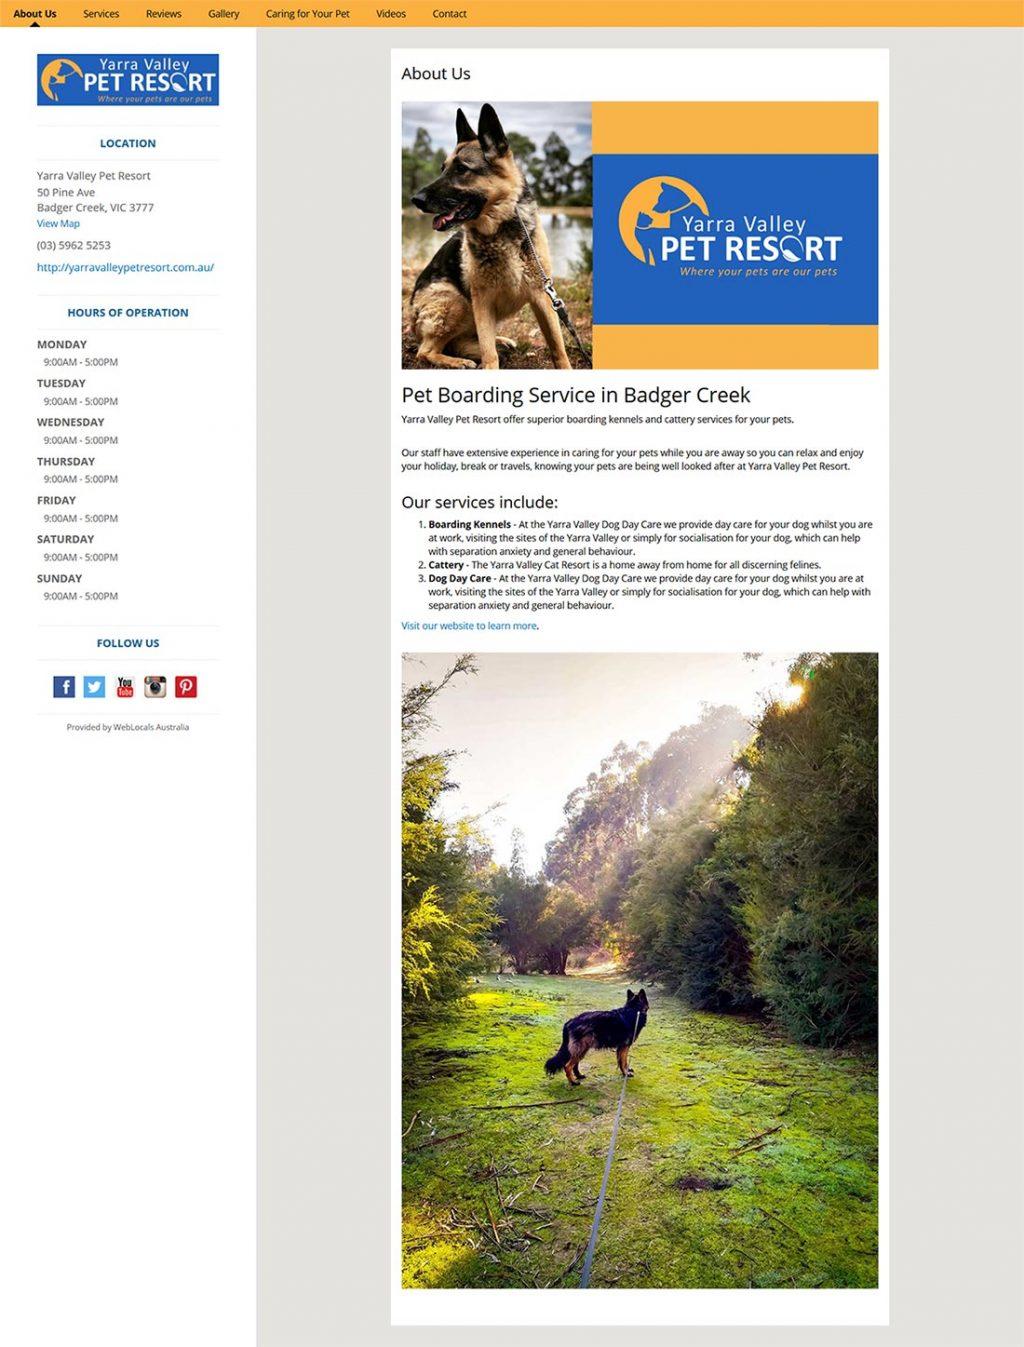 WebLocals_Citation_Yarra_Valley_Pet_Resort_About